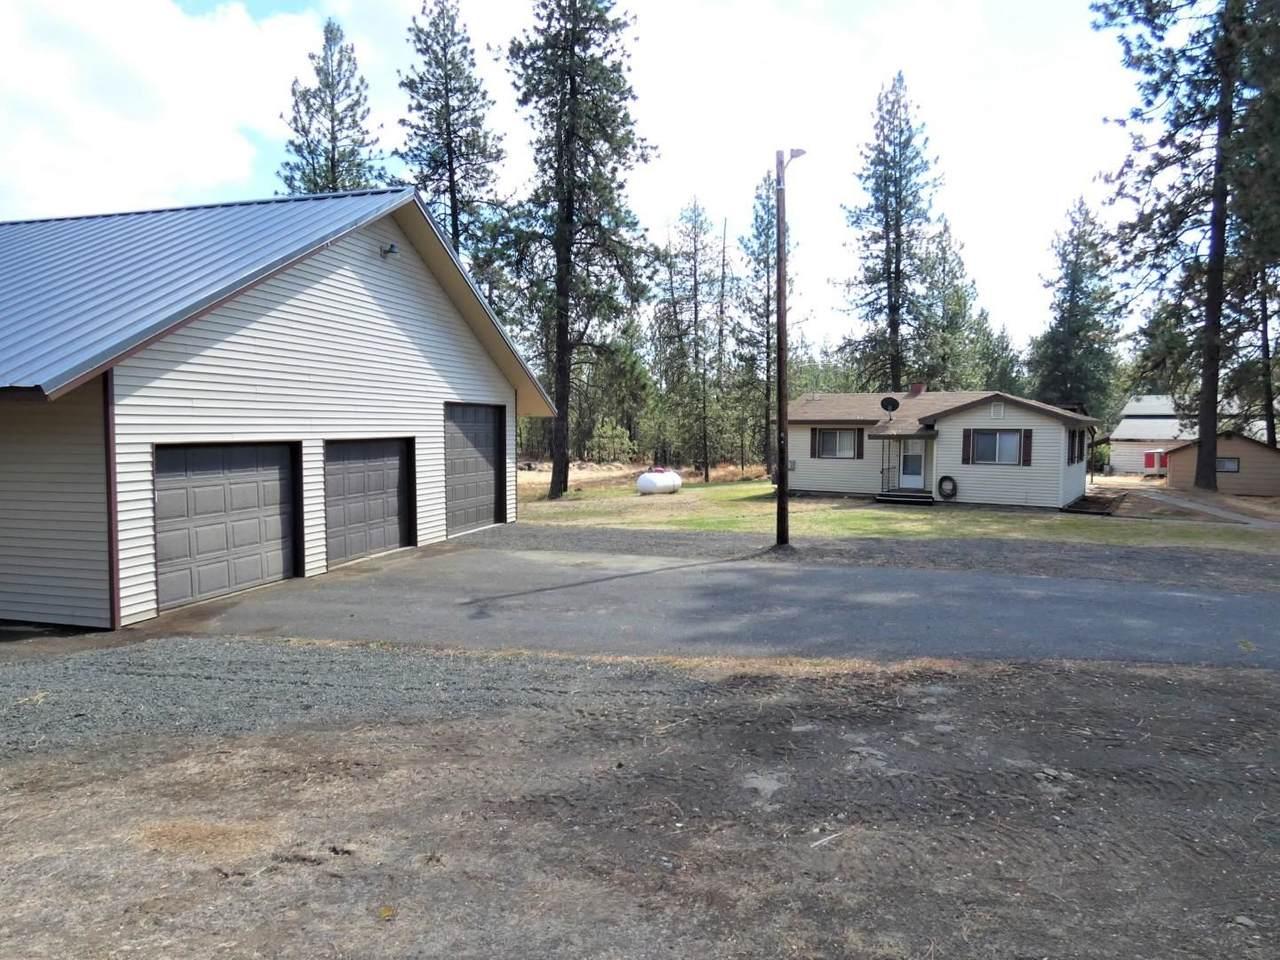 16221 Cheney-Spokane Rd - Photo 1